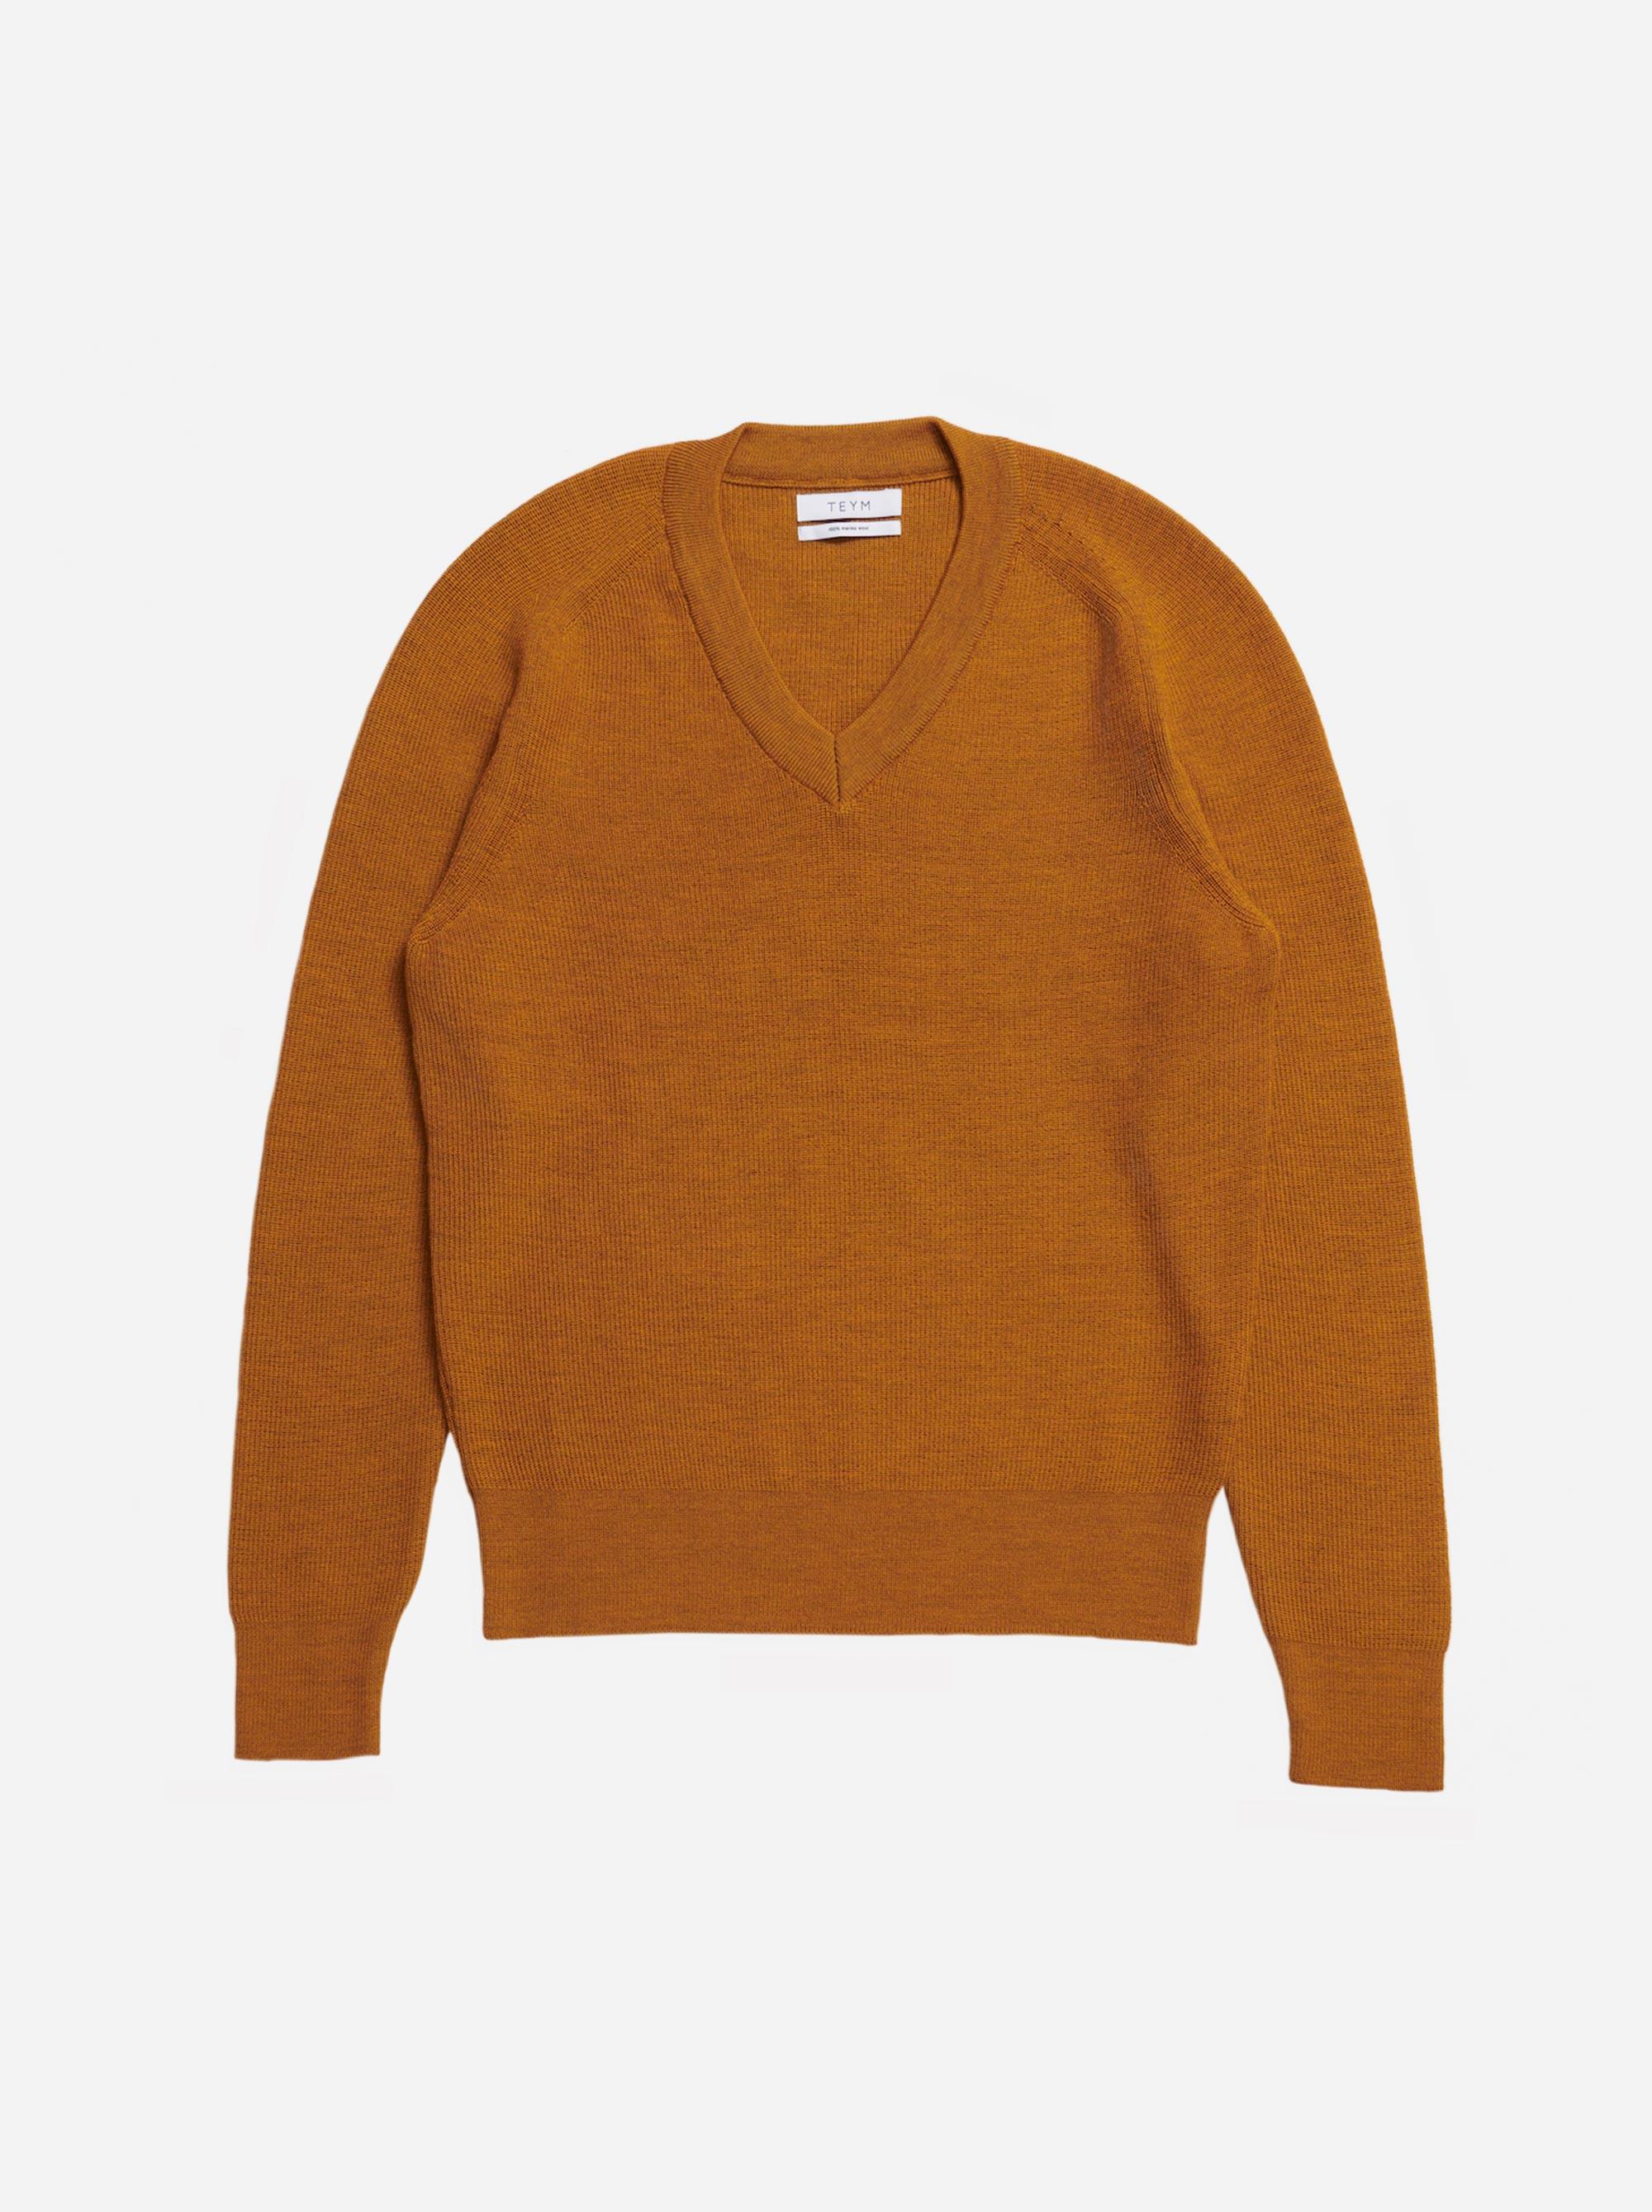 Teym - V-Neck - The Merino Sweater - Men - Mustard - 4